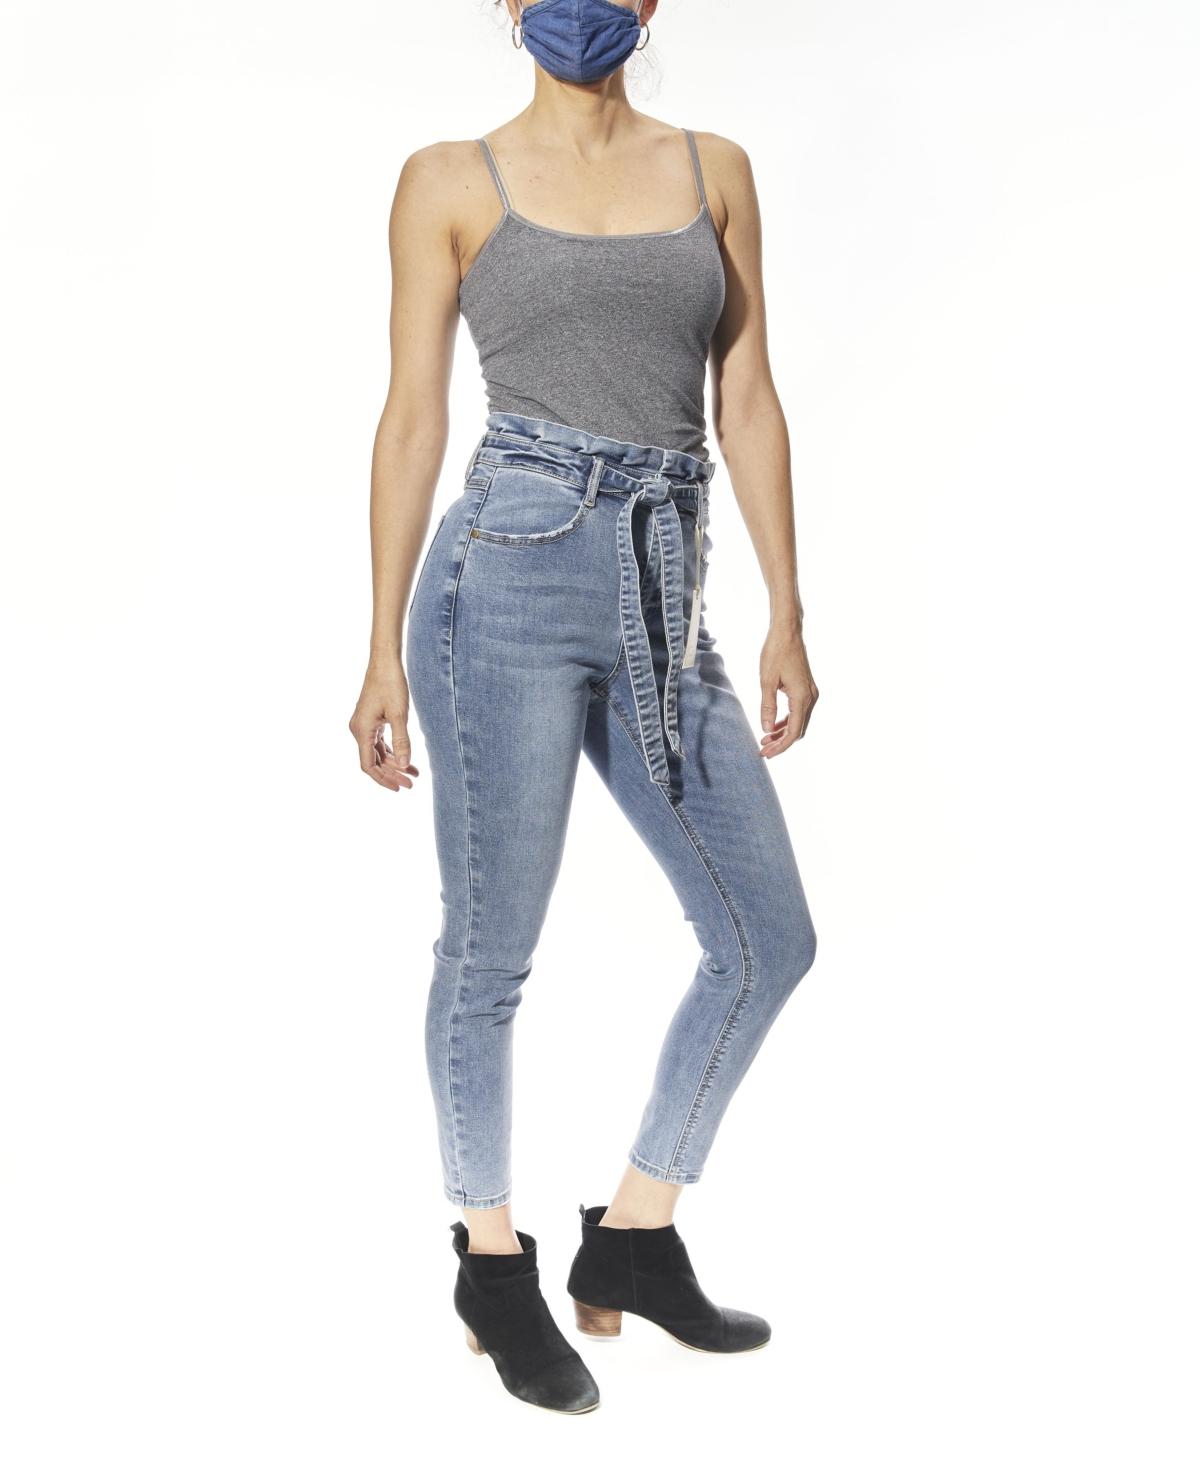 Women's Paperbag Waist Jeans